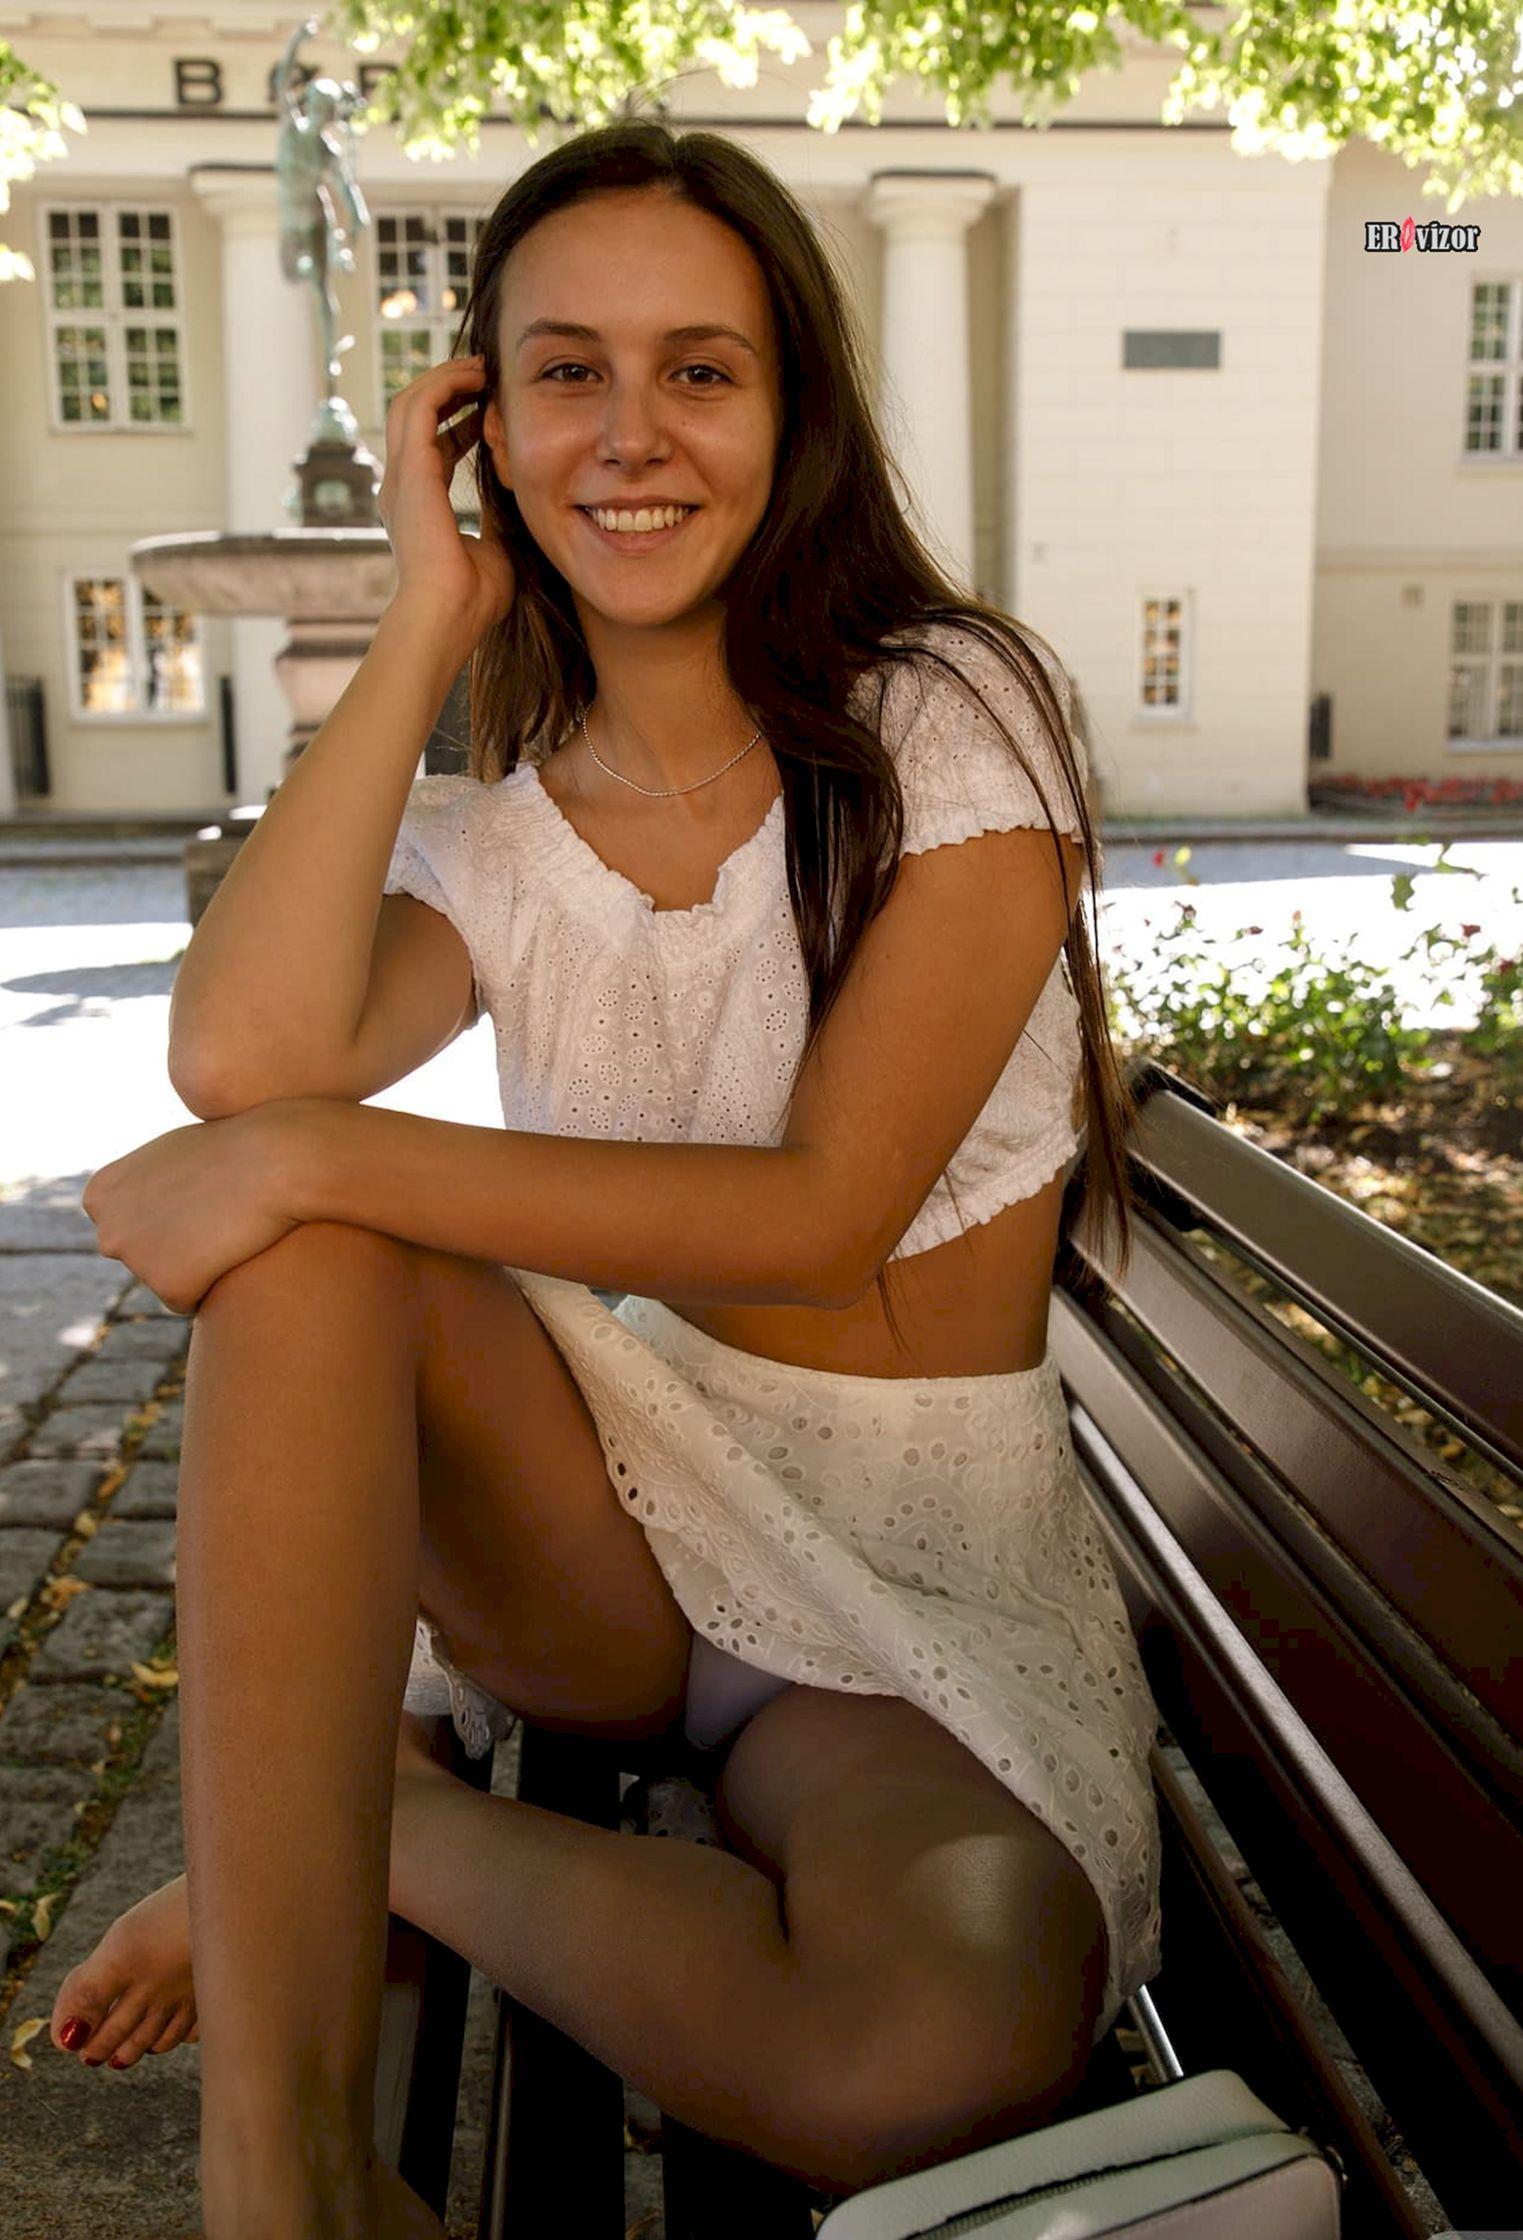 Jessica-Albanka_ero_foto (4)